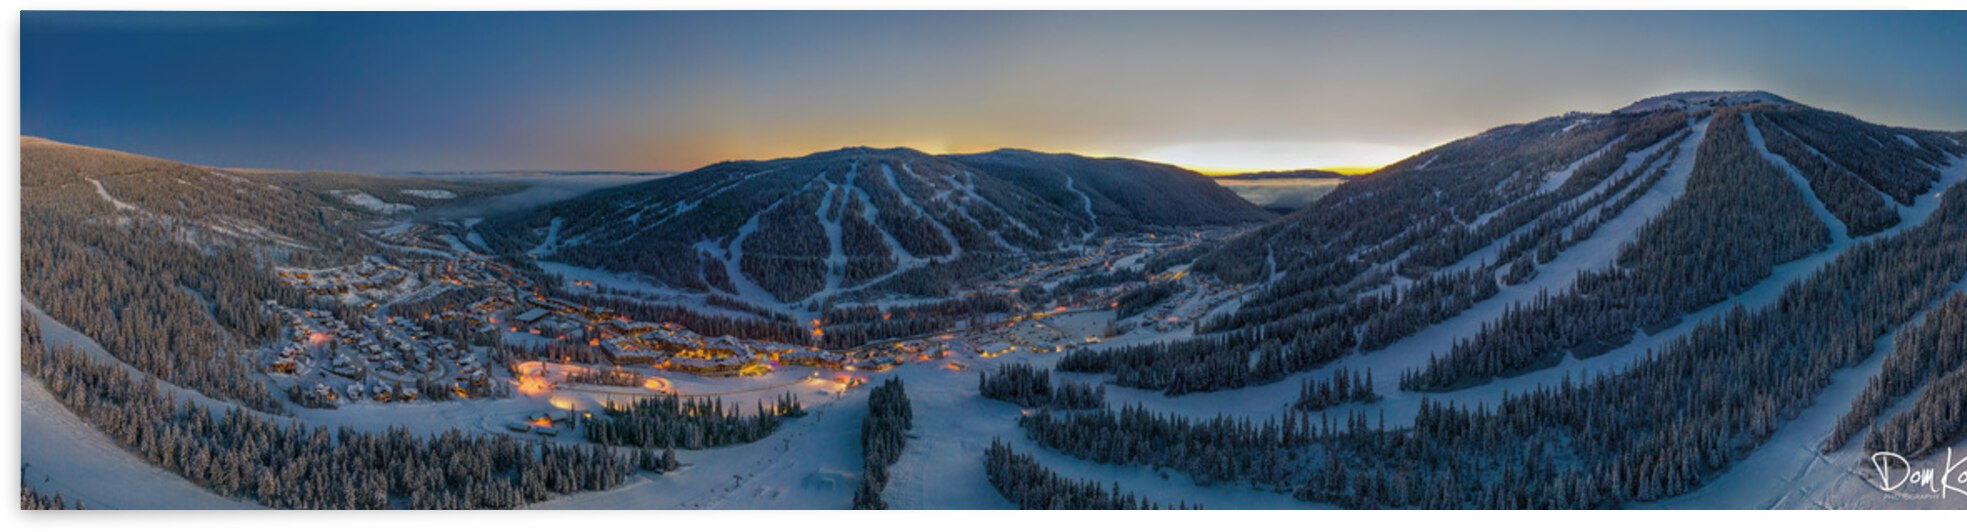 Valley Twilight  by KoricPhoto